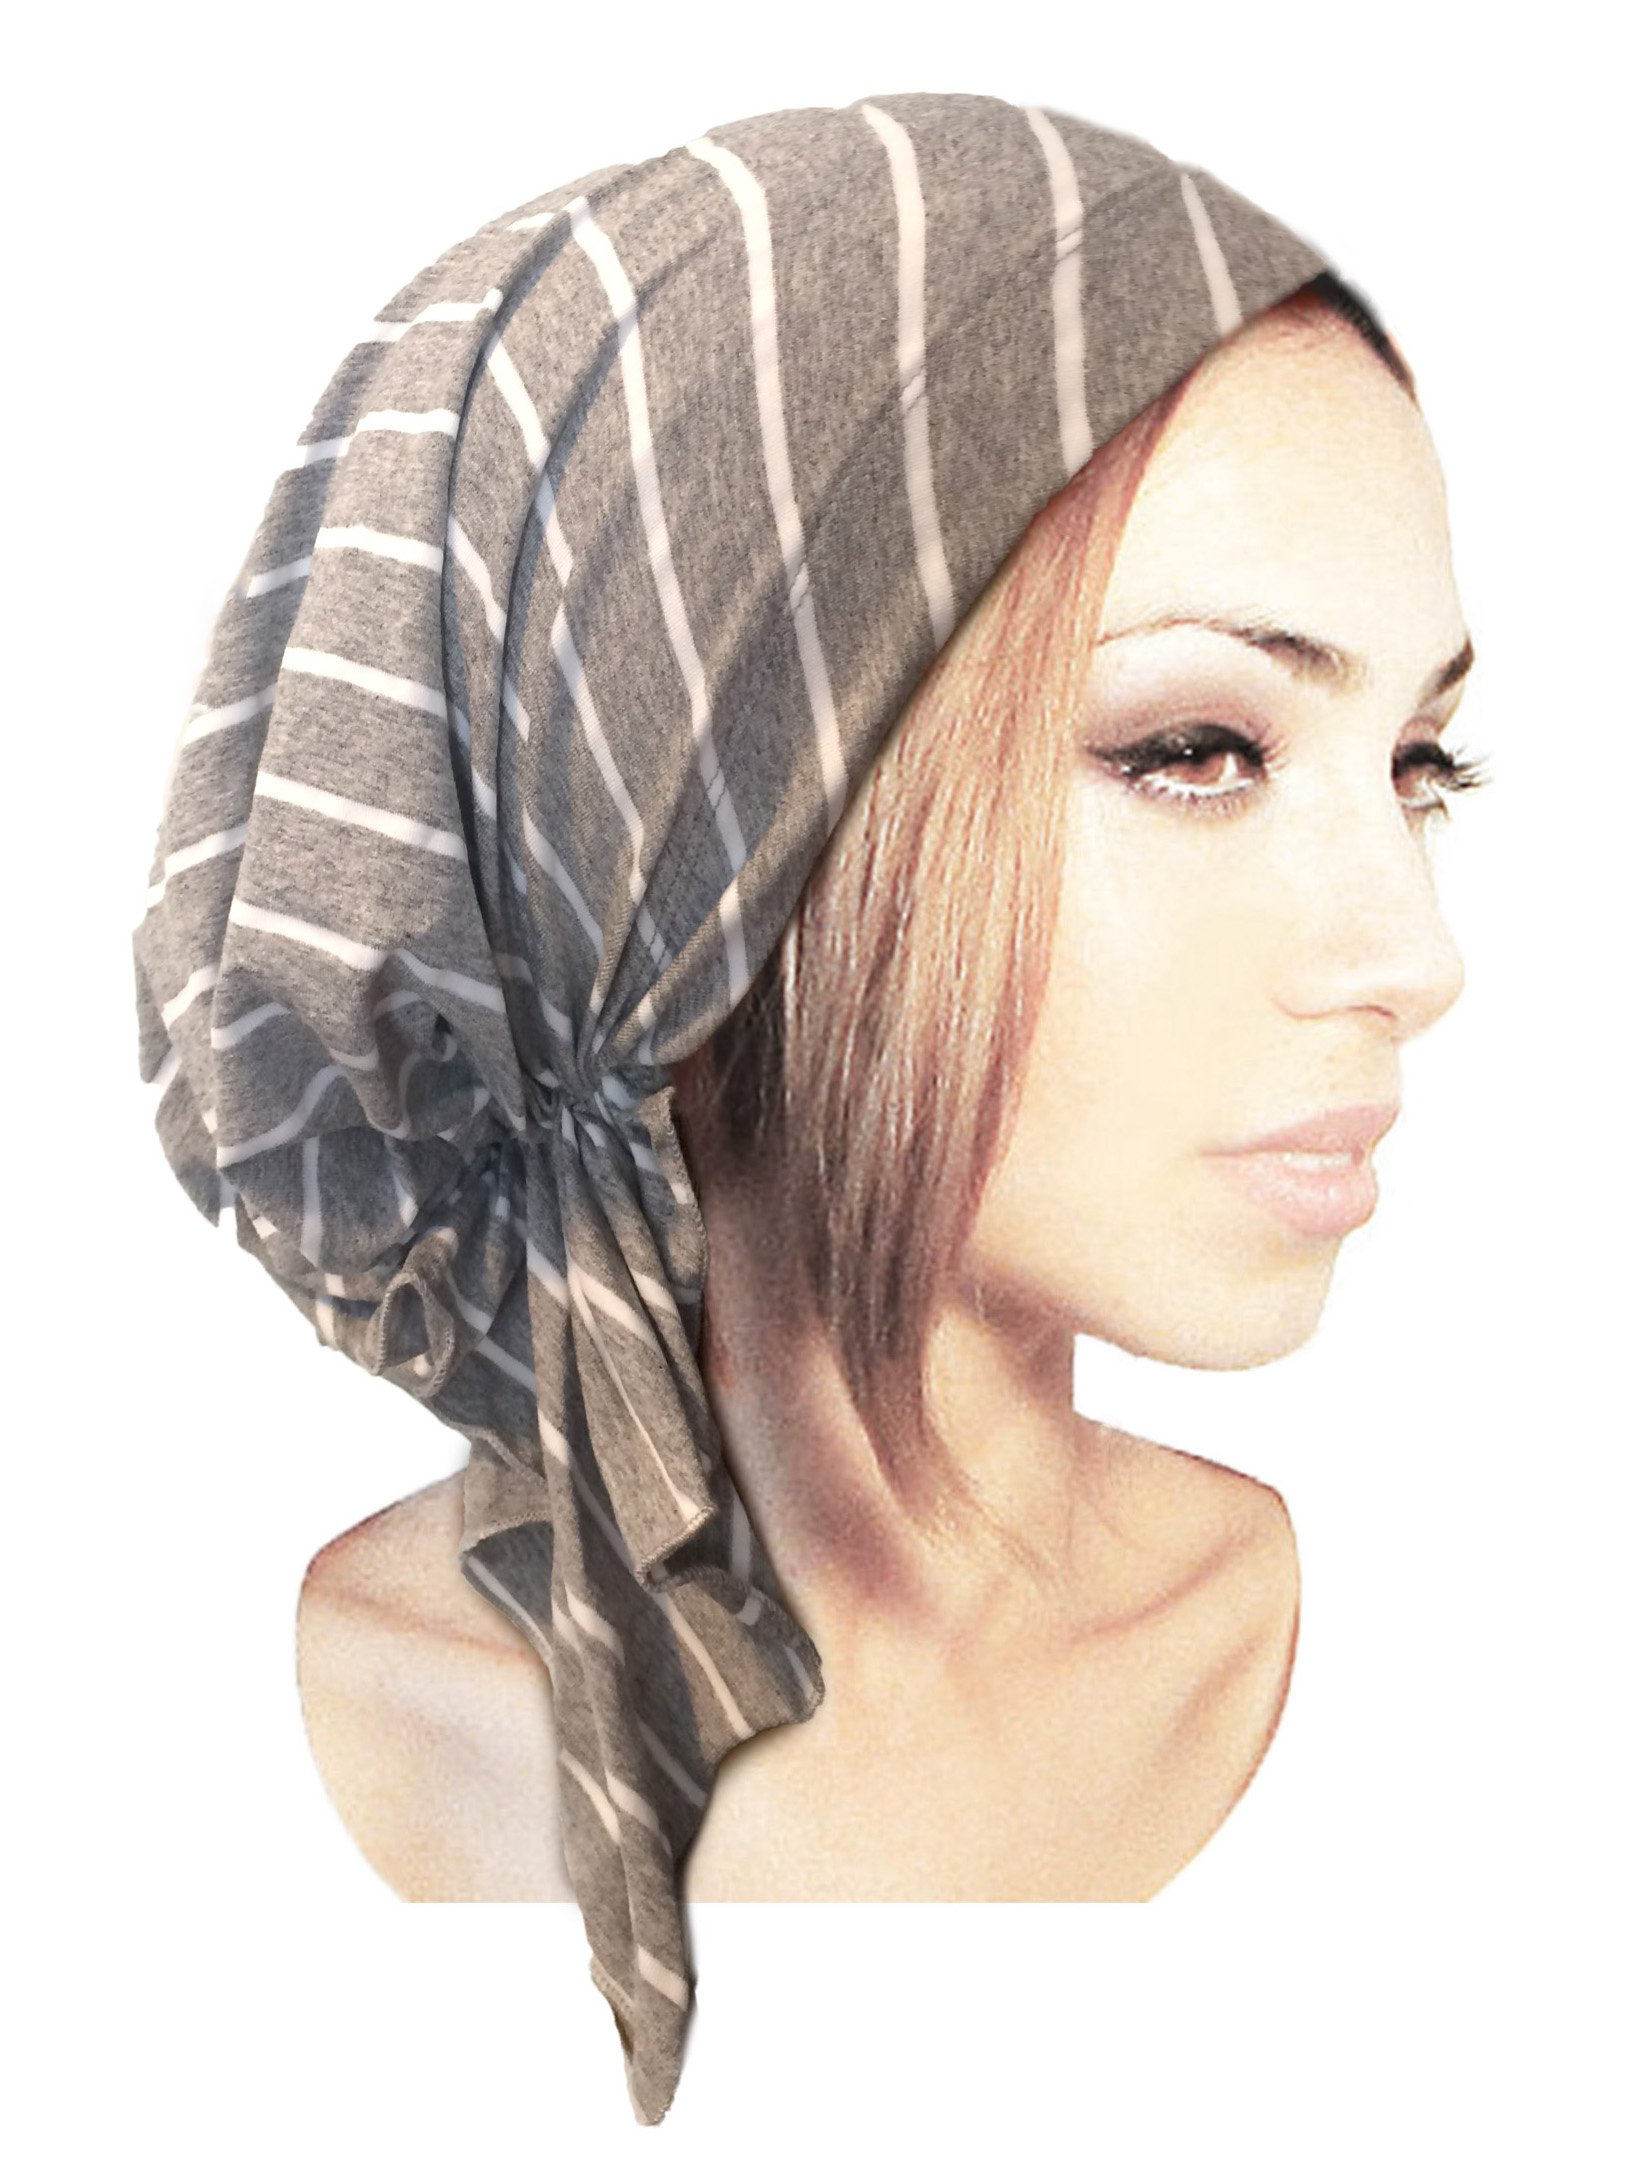 Gray Head-Scarf Pre-Tied Cotton Head-Cover Snood Chemo Cancer & Tichel Friendly in 30 Colors! (Gray White Stripe Short)